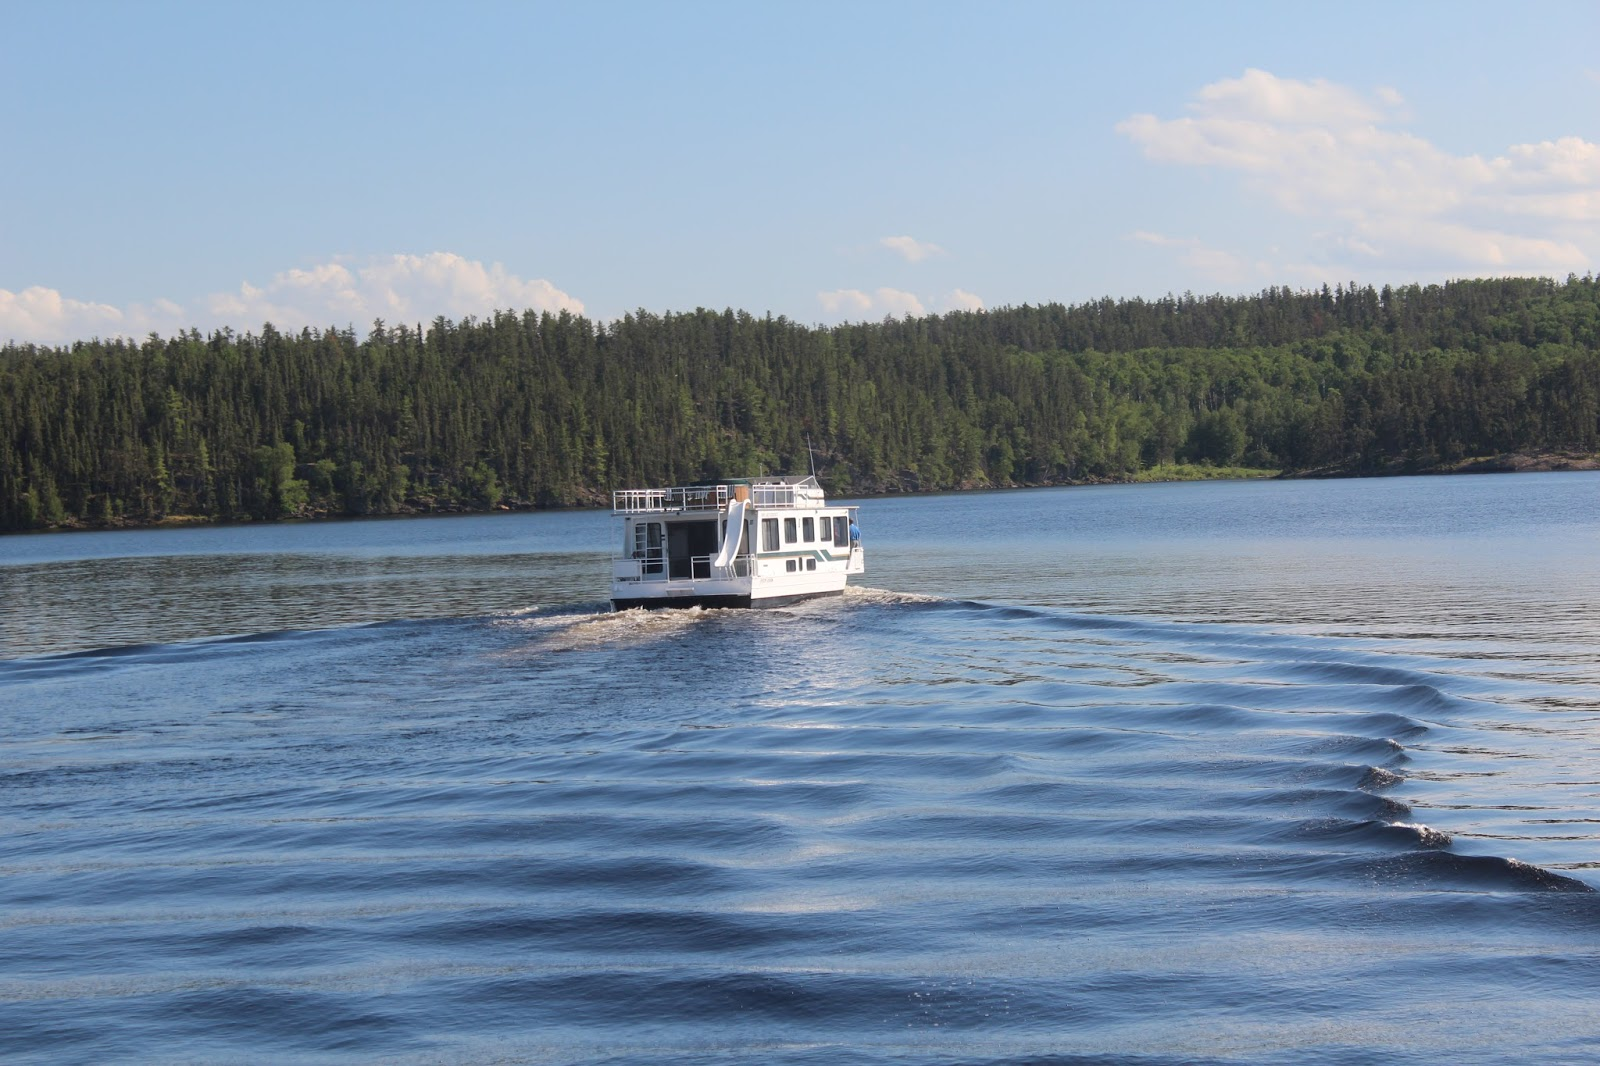 Rainy lake houseboats fishing report afg chairman ii trip for Rainy lake fishing report